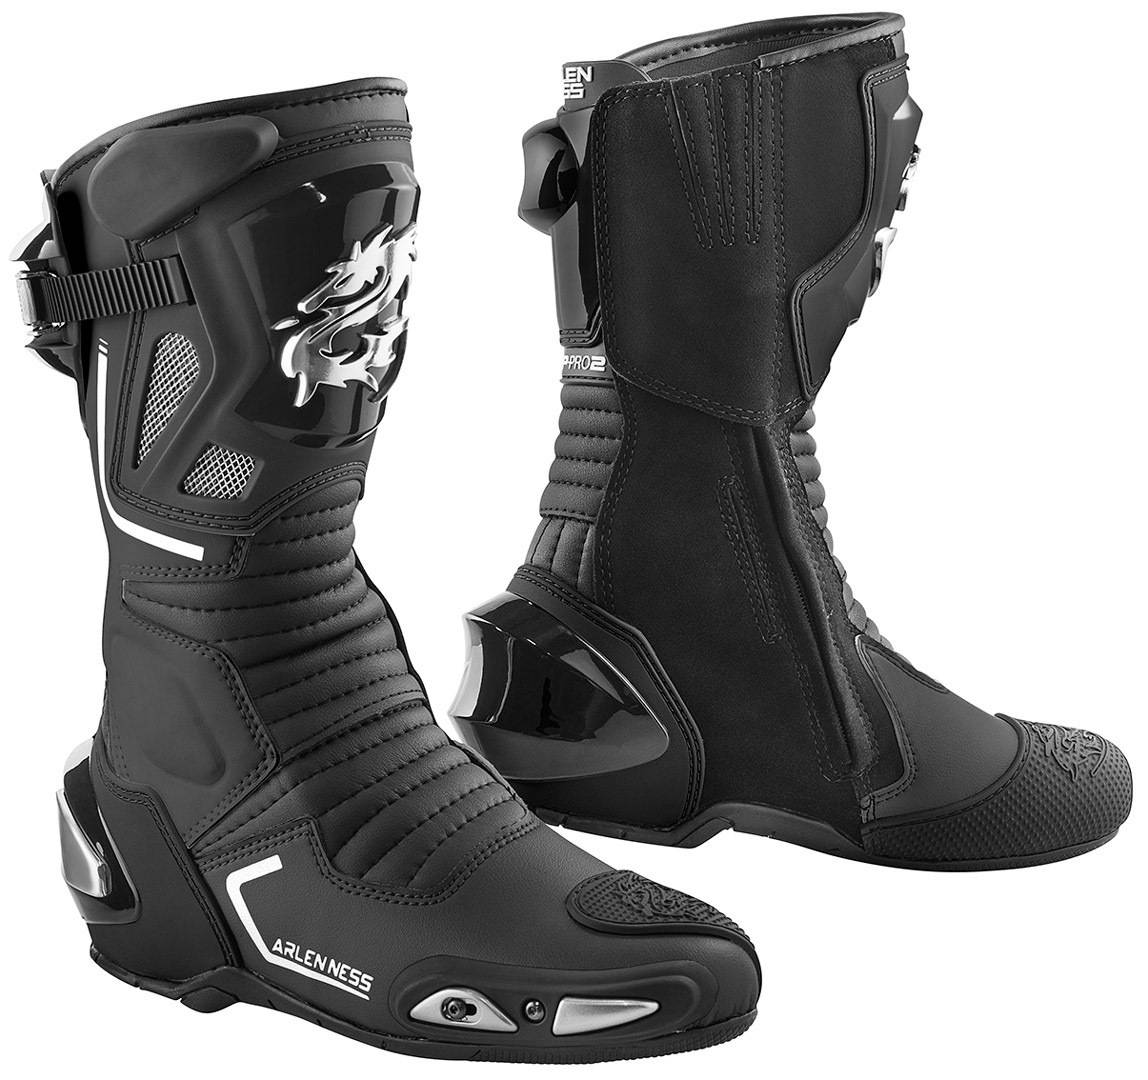 Arlen Ness Sugello Bottes de moto Noir taille : 48